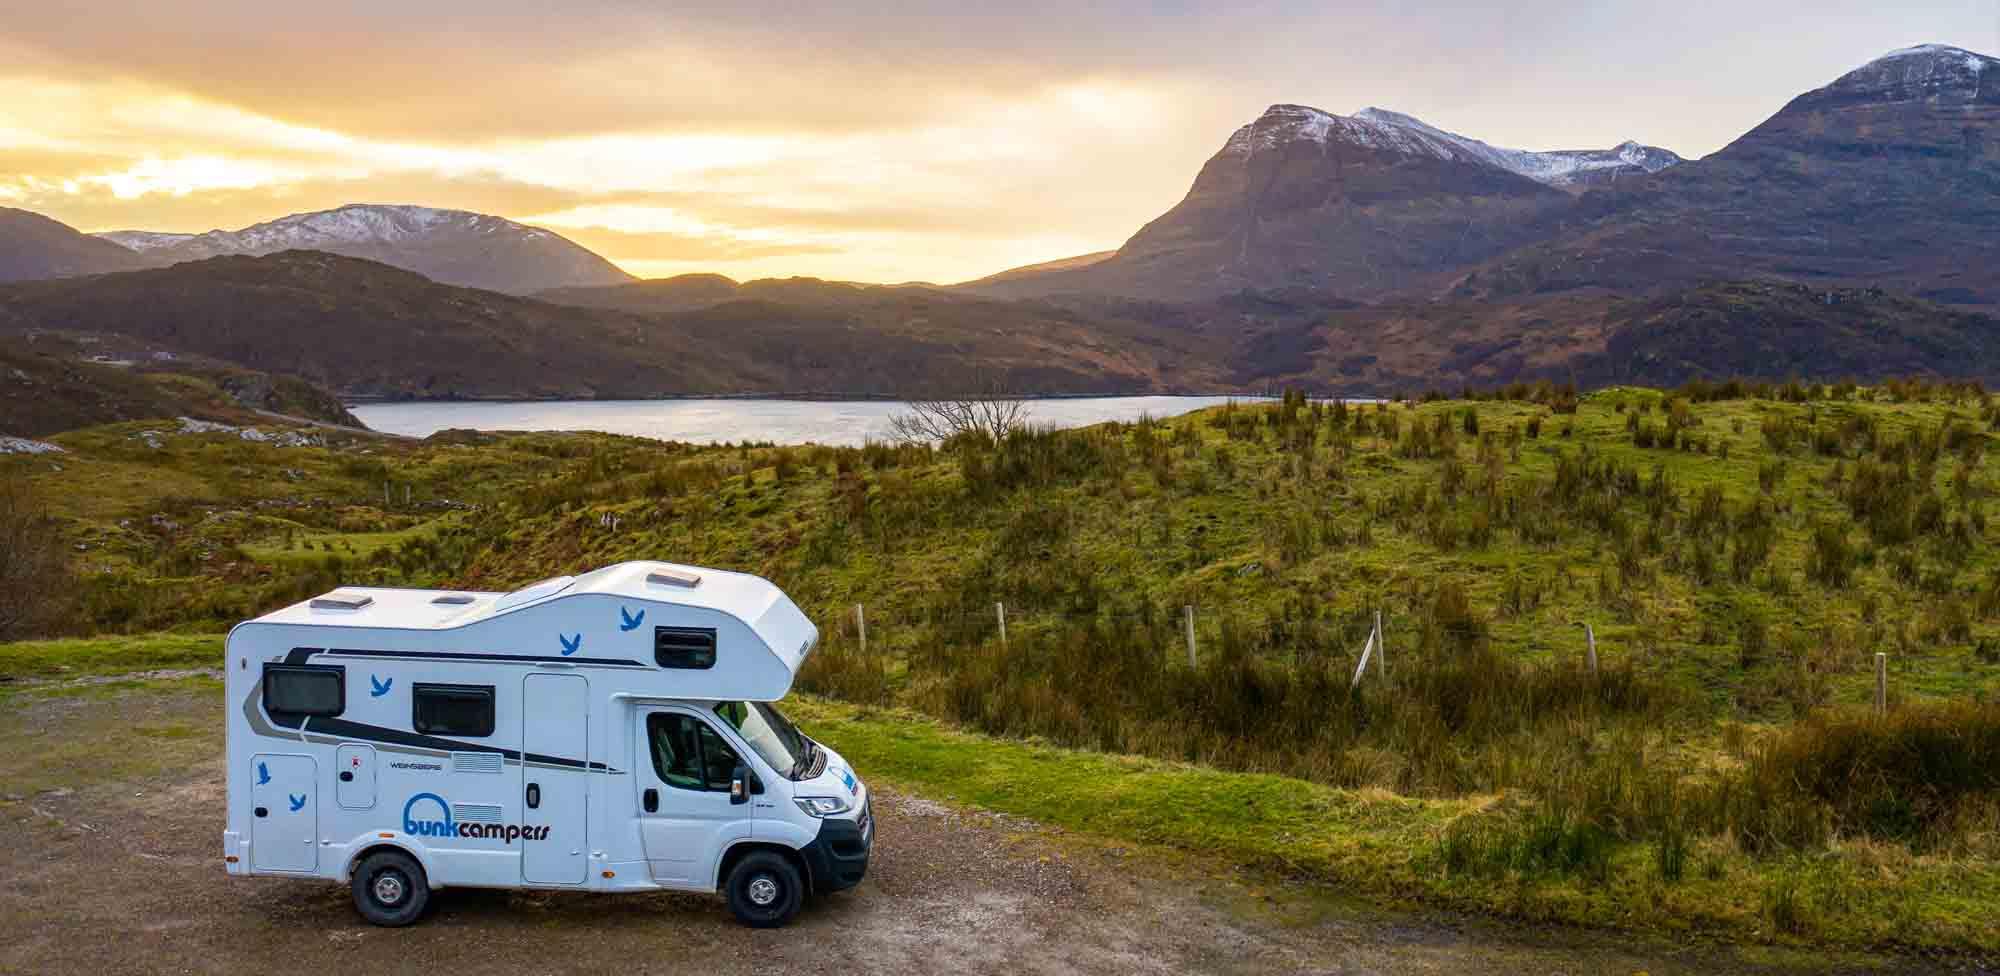 Scotland campervans